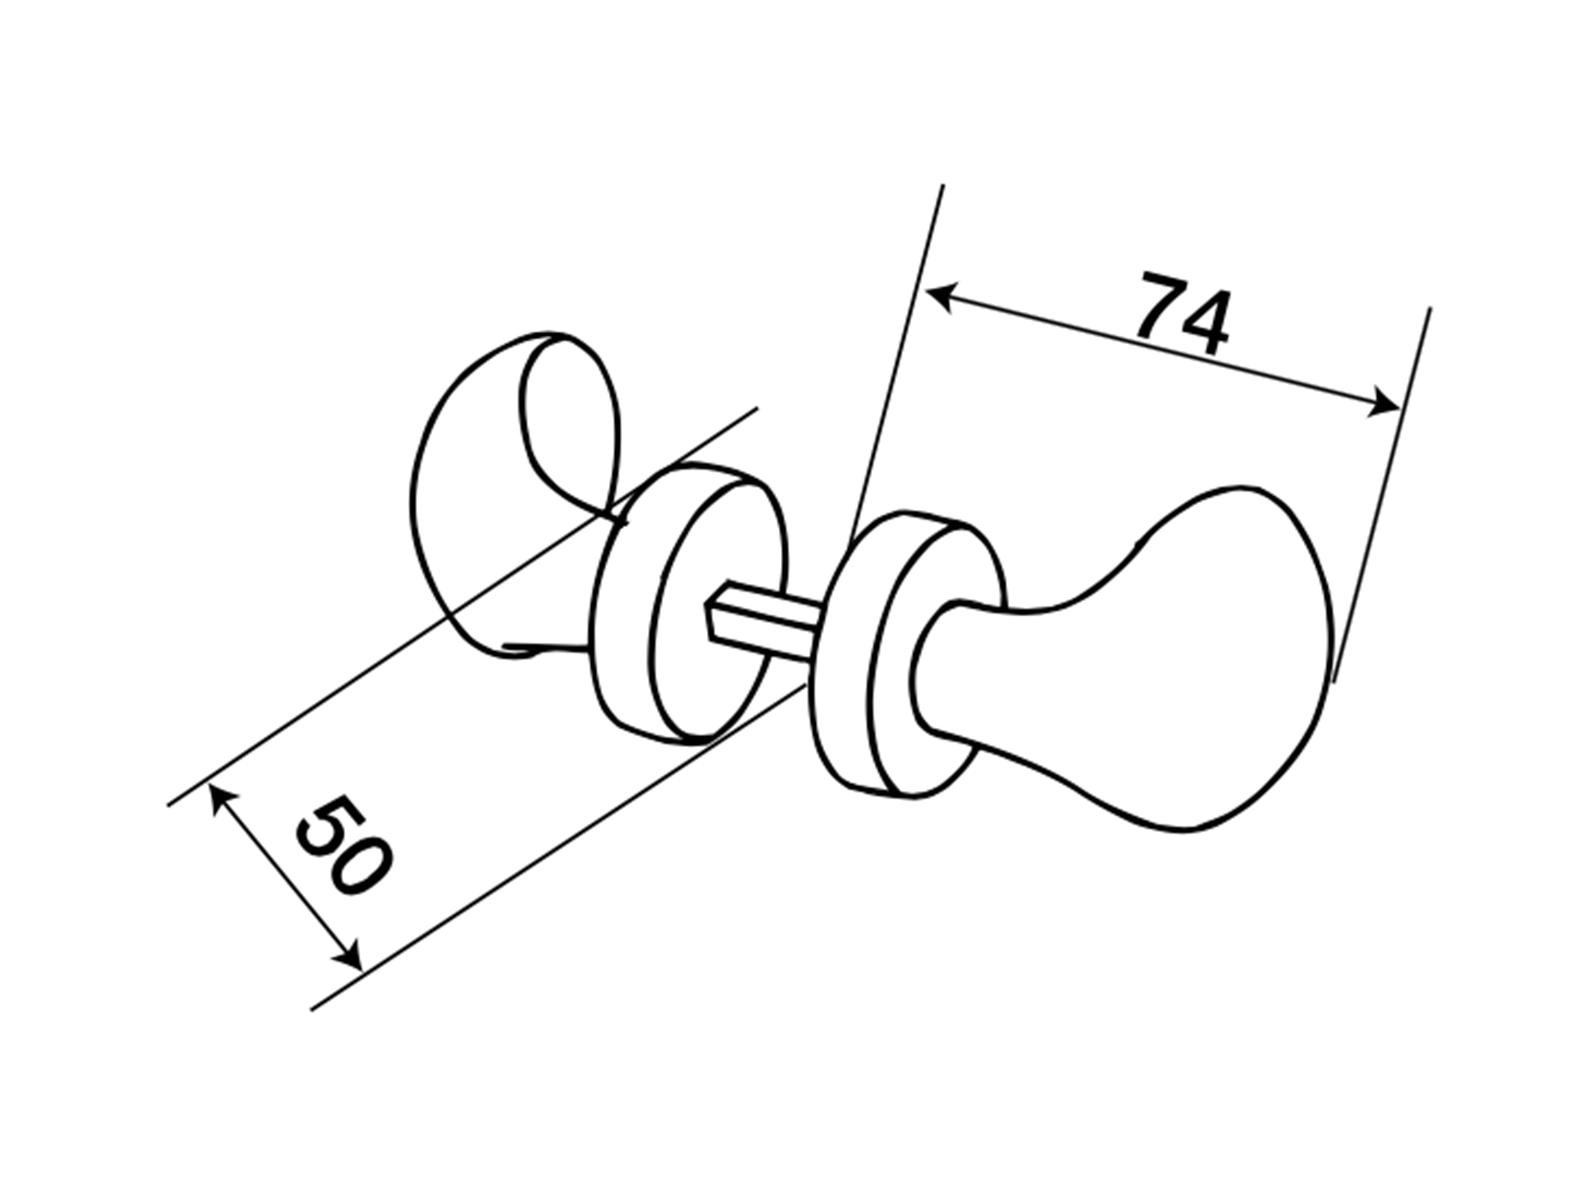 507-cp-mis